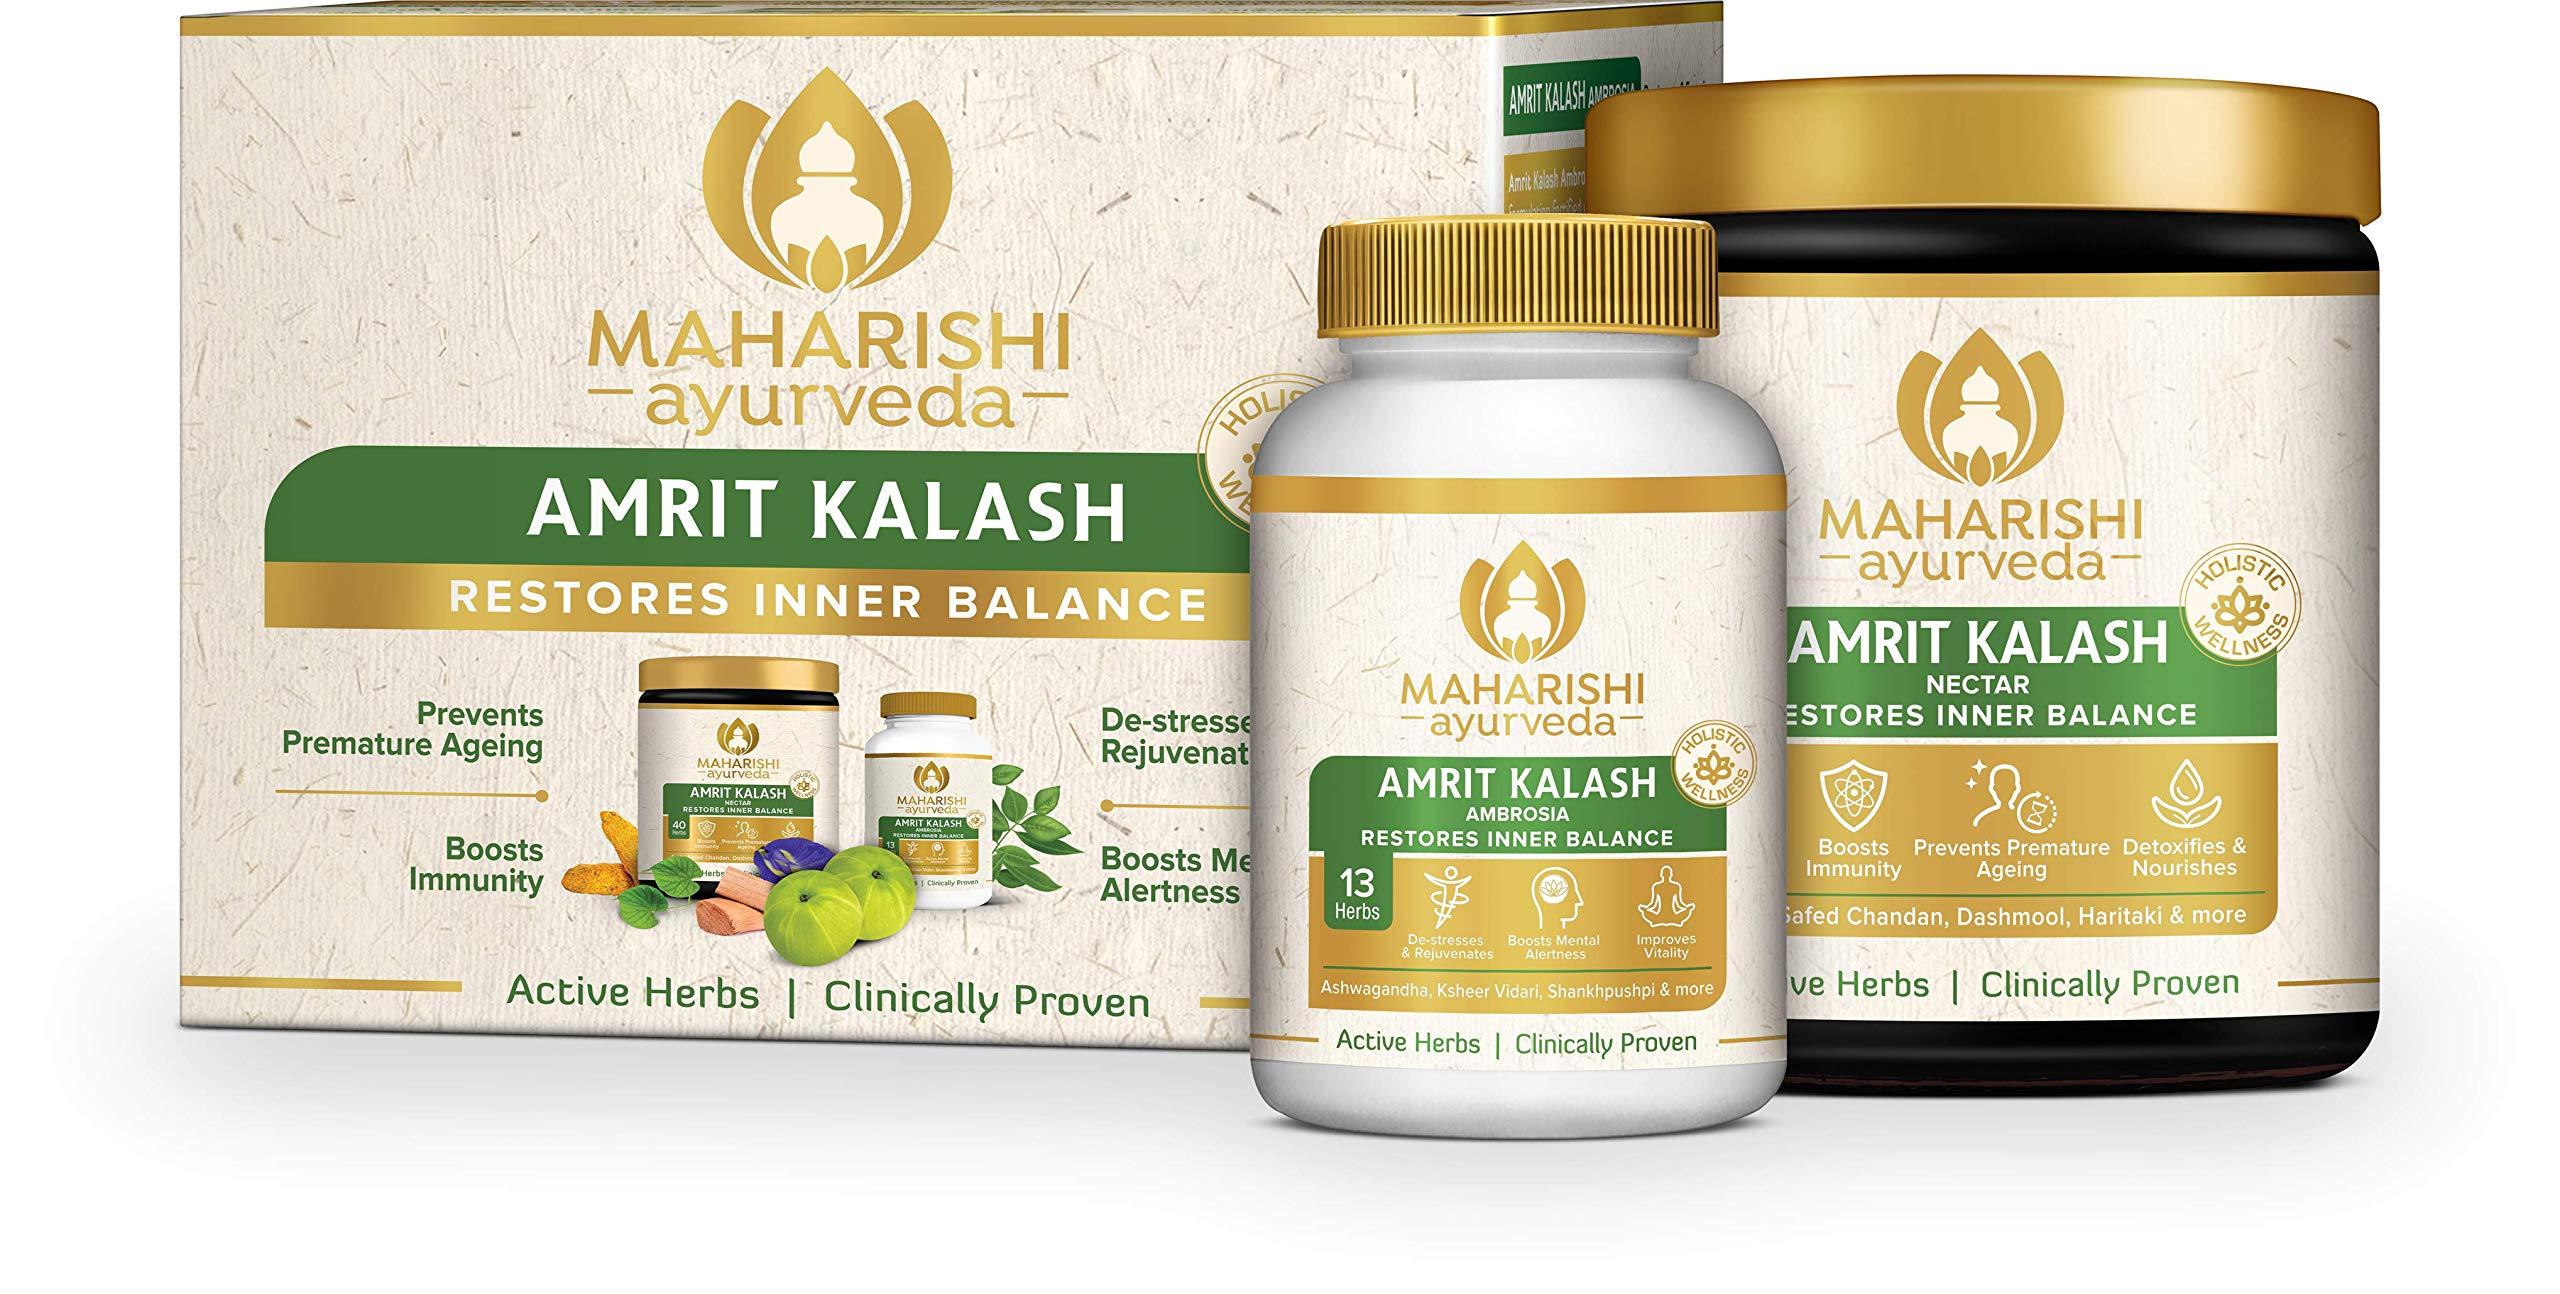 Maharishi Ayurveda Amrit Kalash: Ayurvedic Medicine For Stress & Anxiety, Includes Nectar (600g Paste) & Ambrosia (60 Tablets).